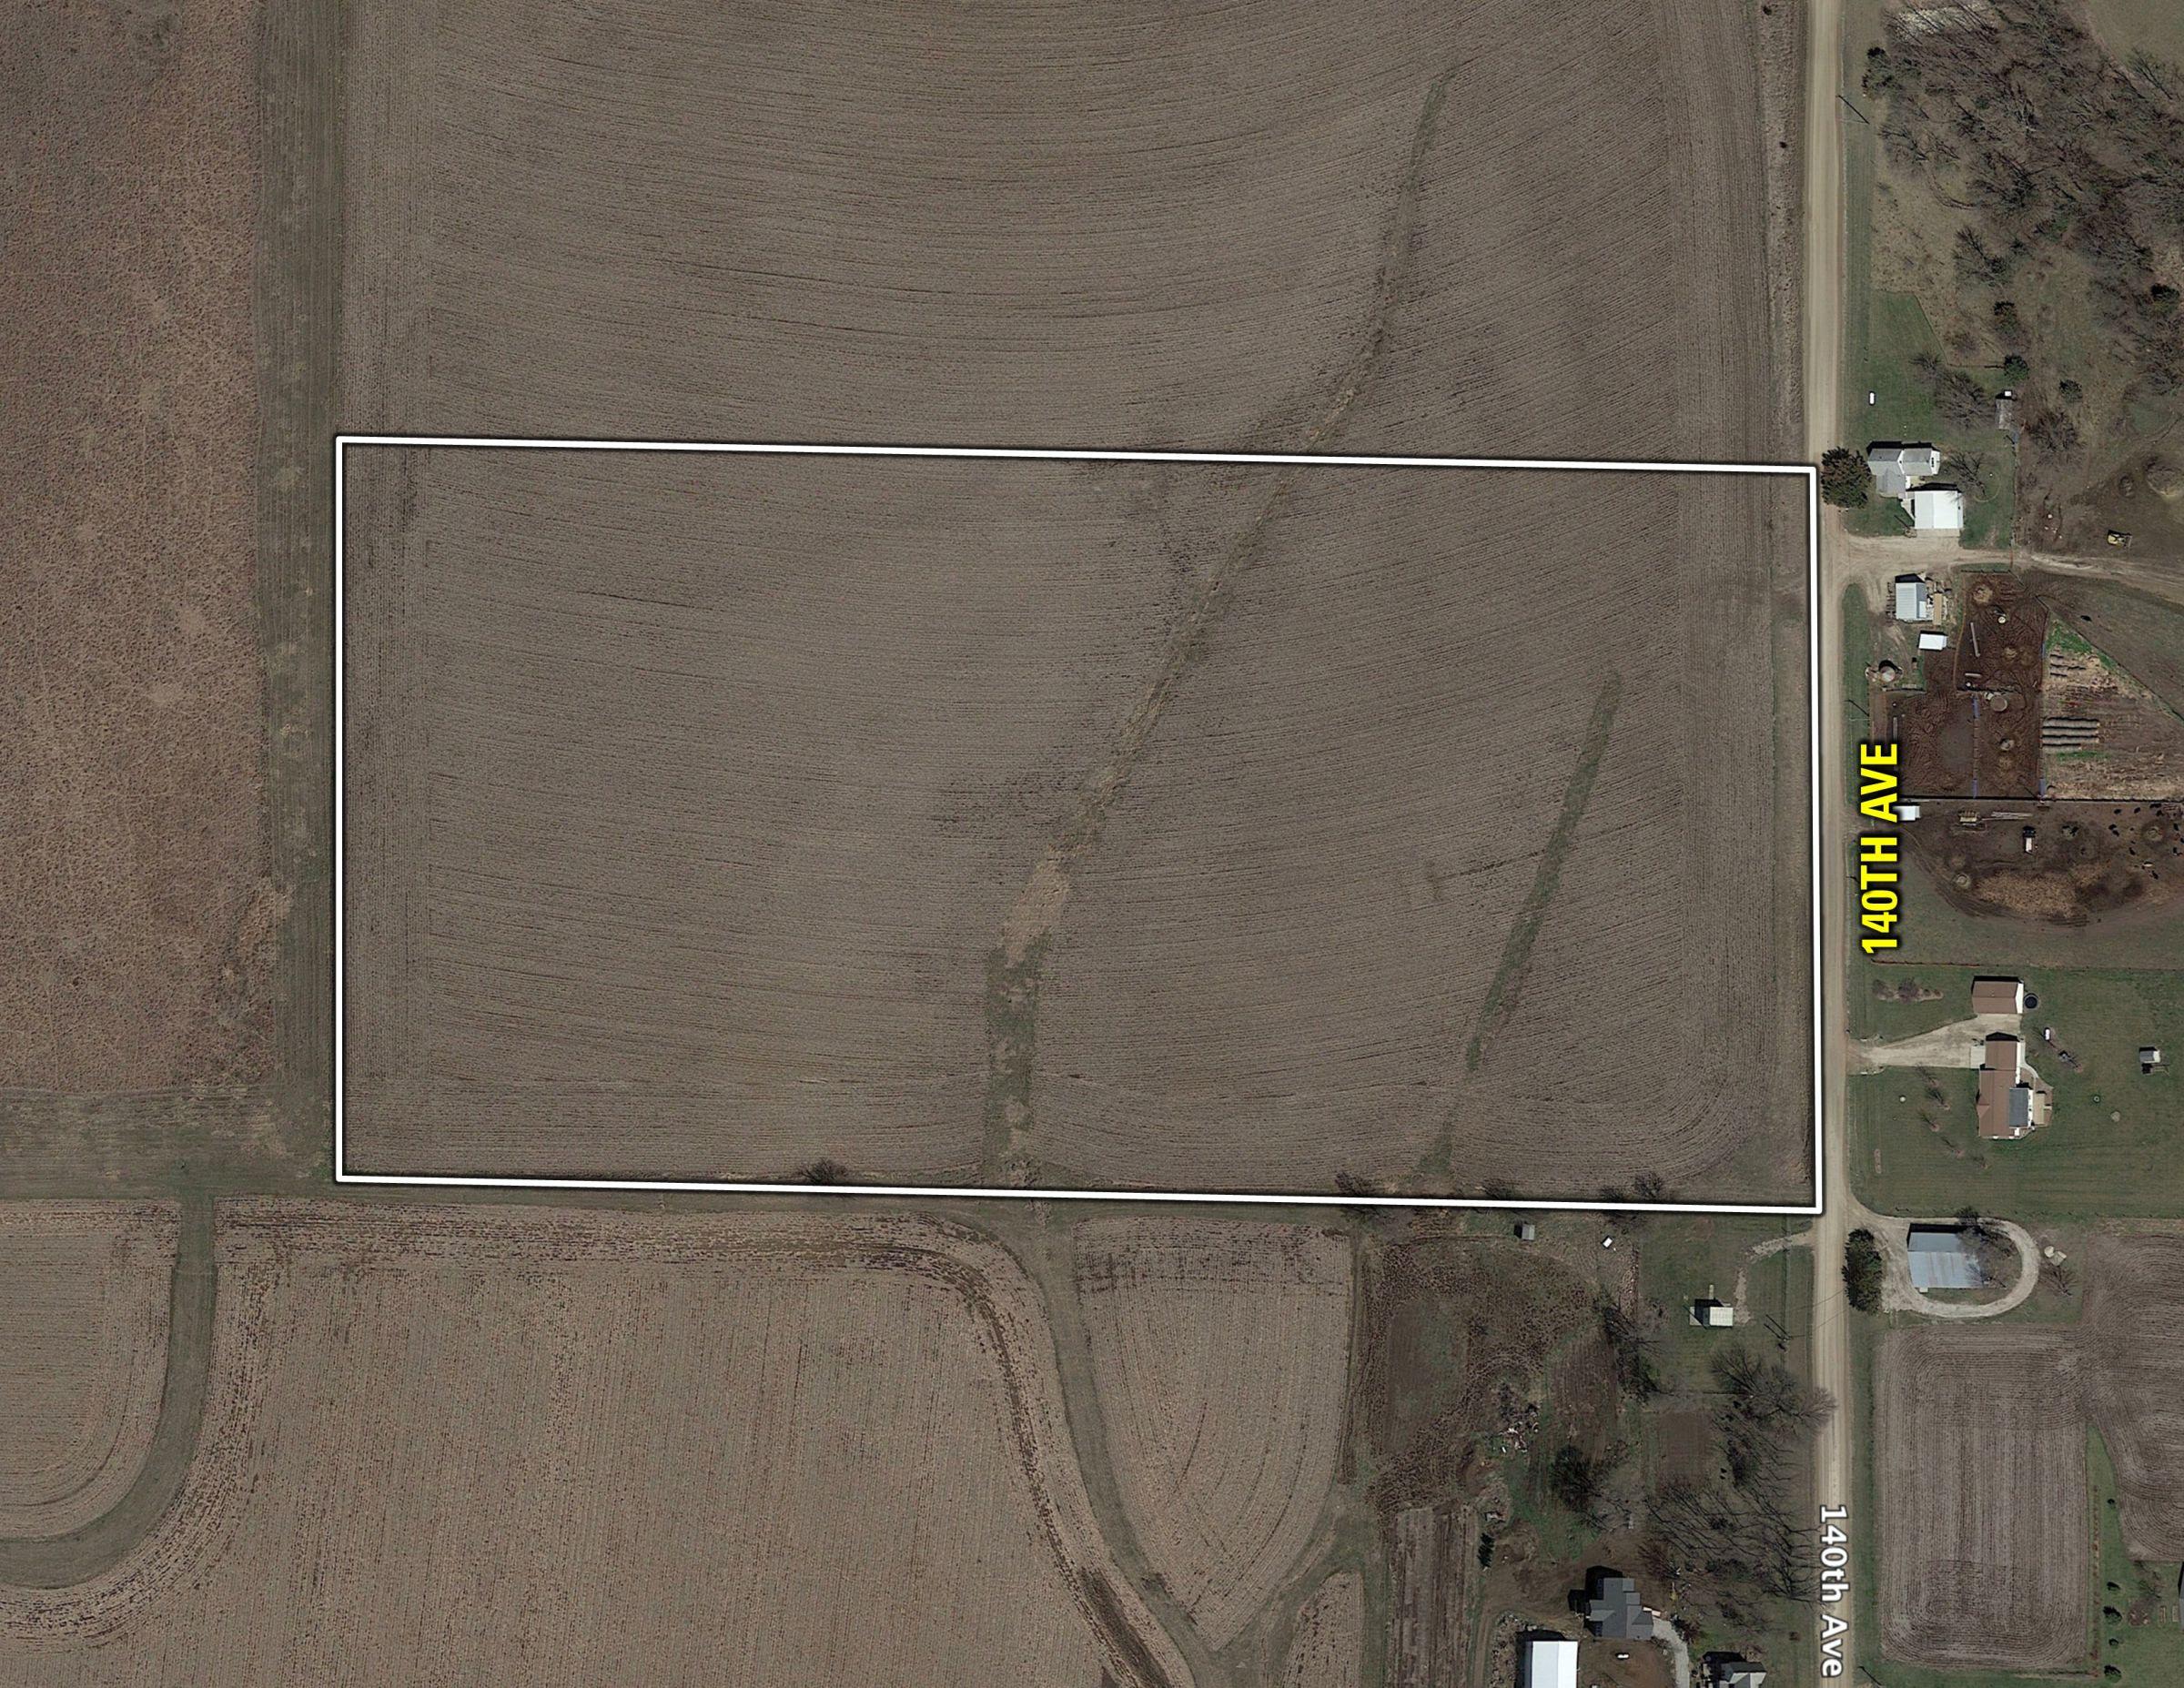 development-land-warren-county-iowa-20-acres-listing-number-15423-0-2021-03-26-161219.jpg